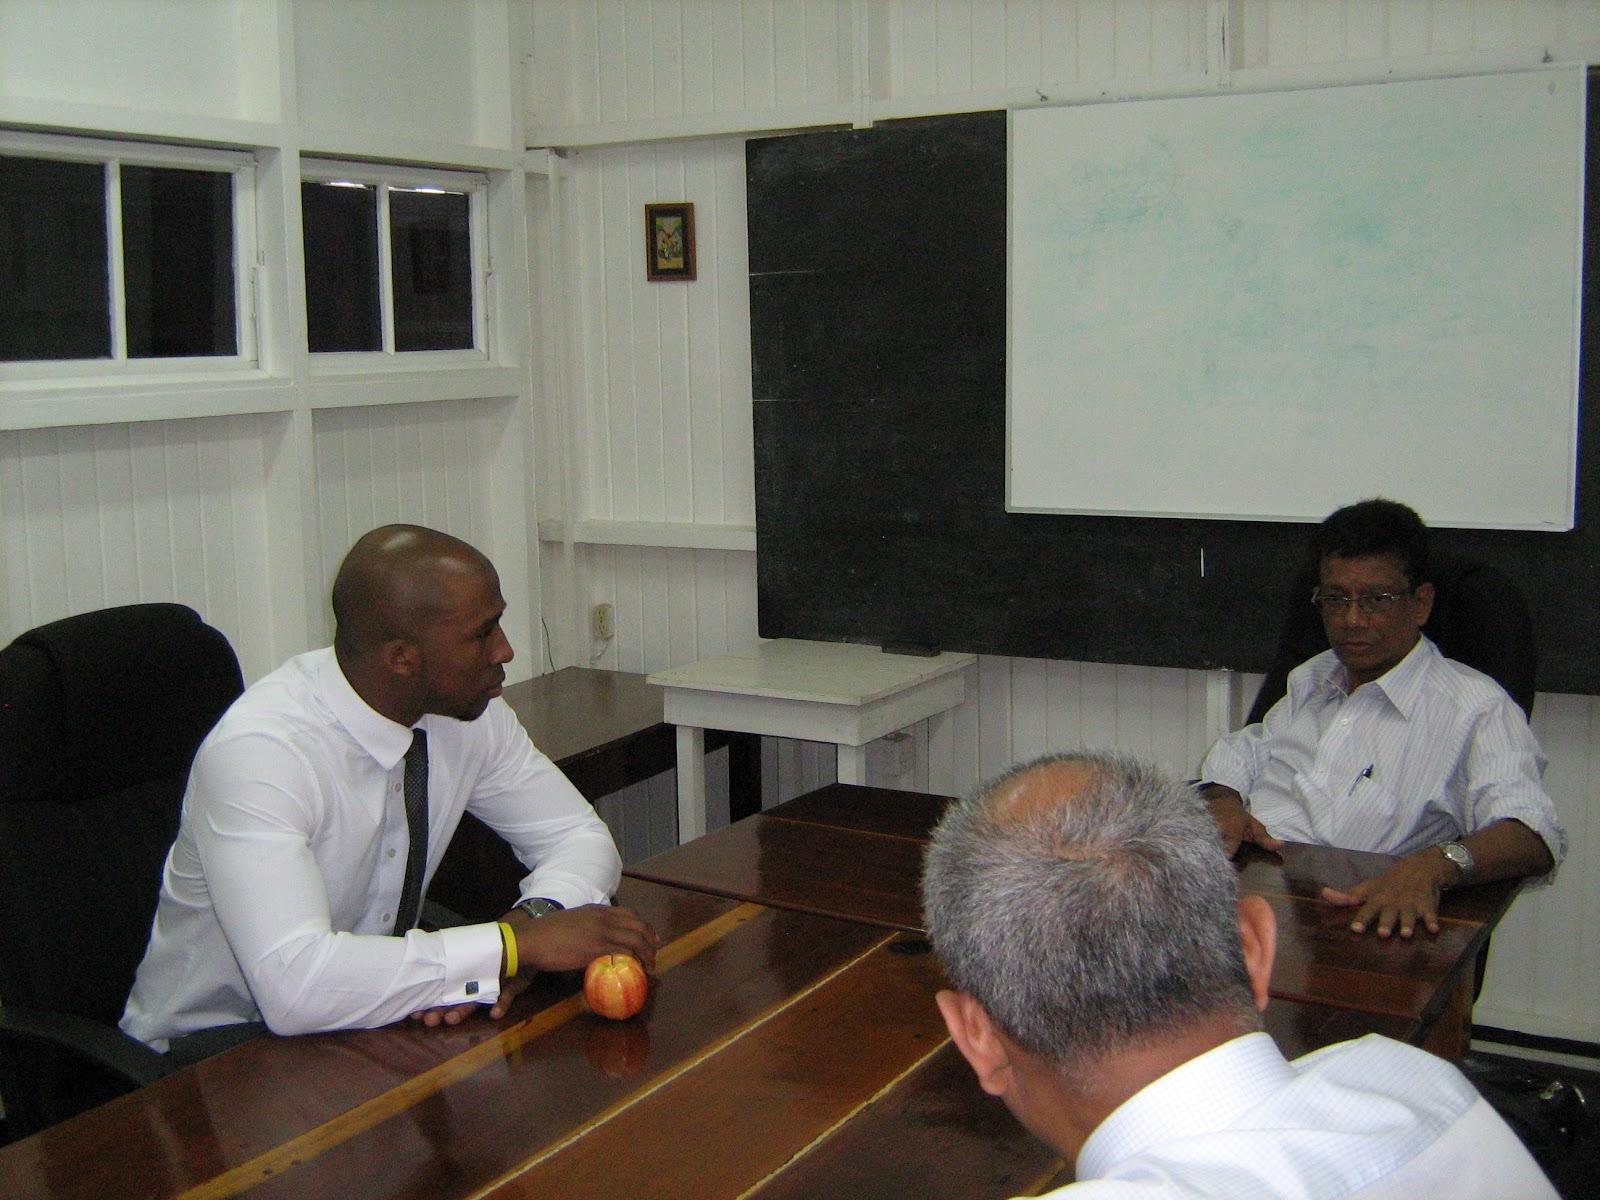 Ryan Hinds - Guyana Help The Kids